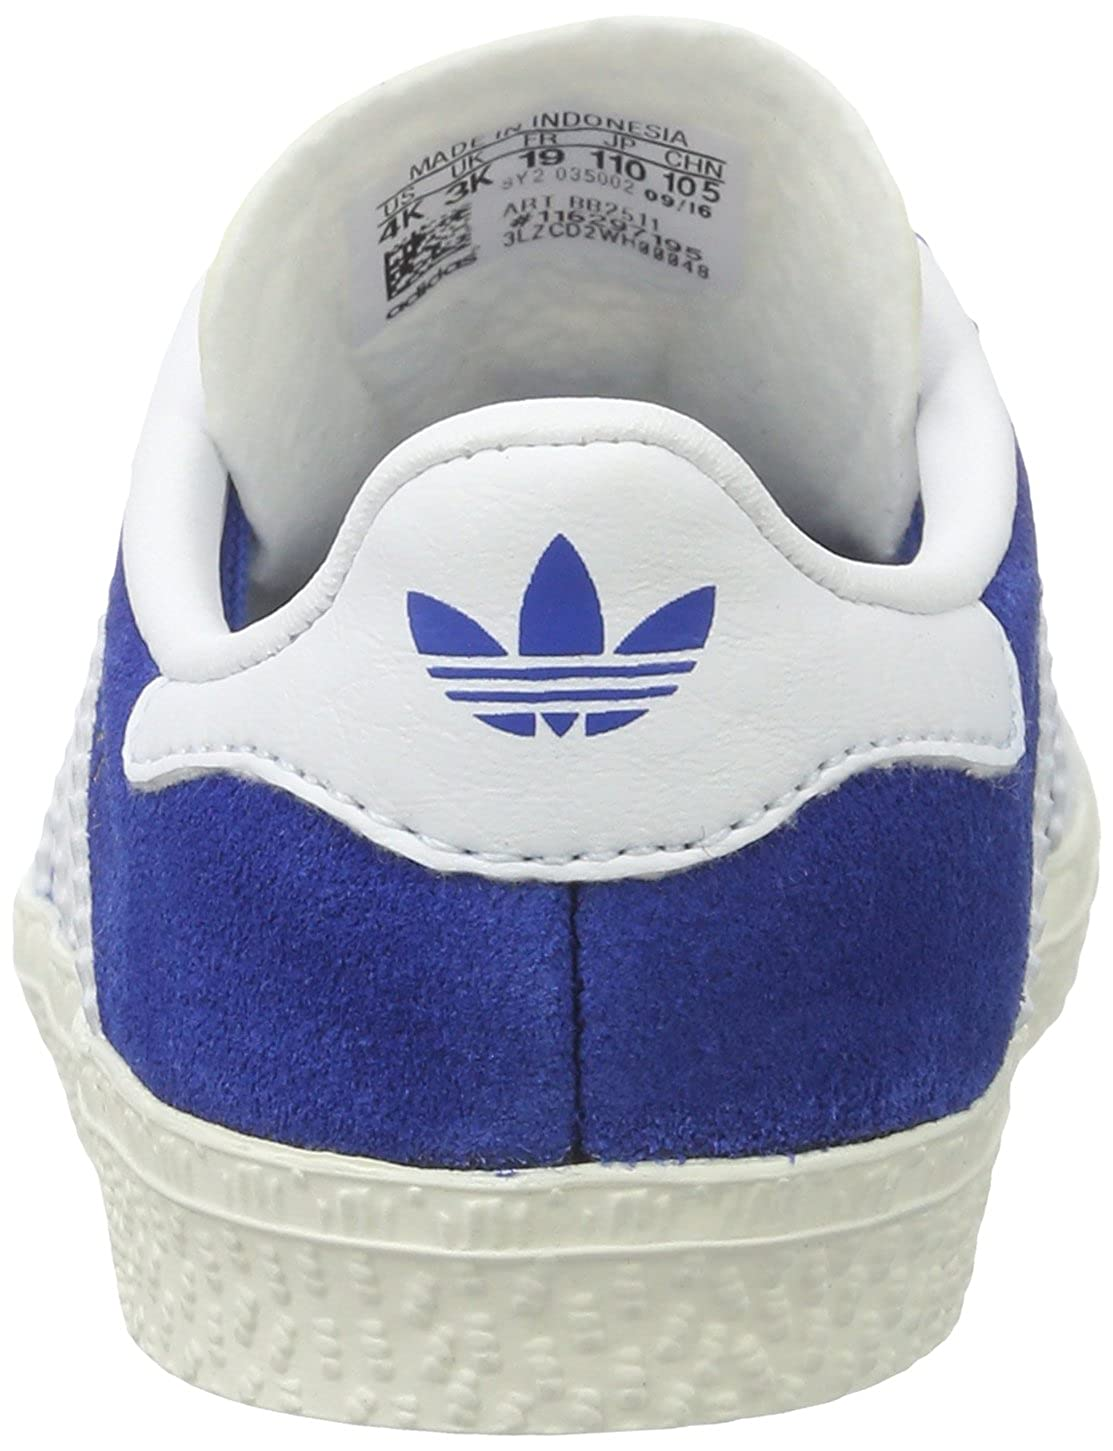 adidas Gazelle, Sneakers Basses Mixte Enfant Bleu (Blue/Ftwr White/Gold Metallic)